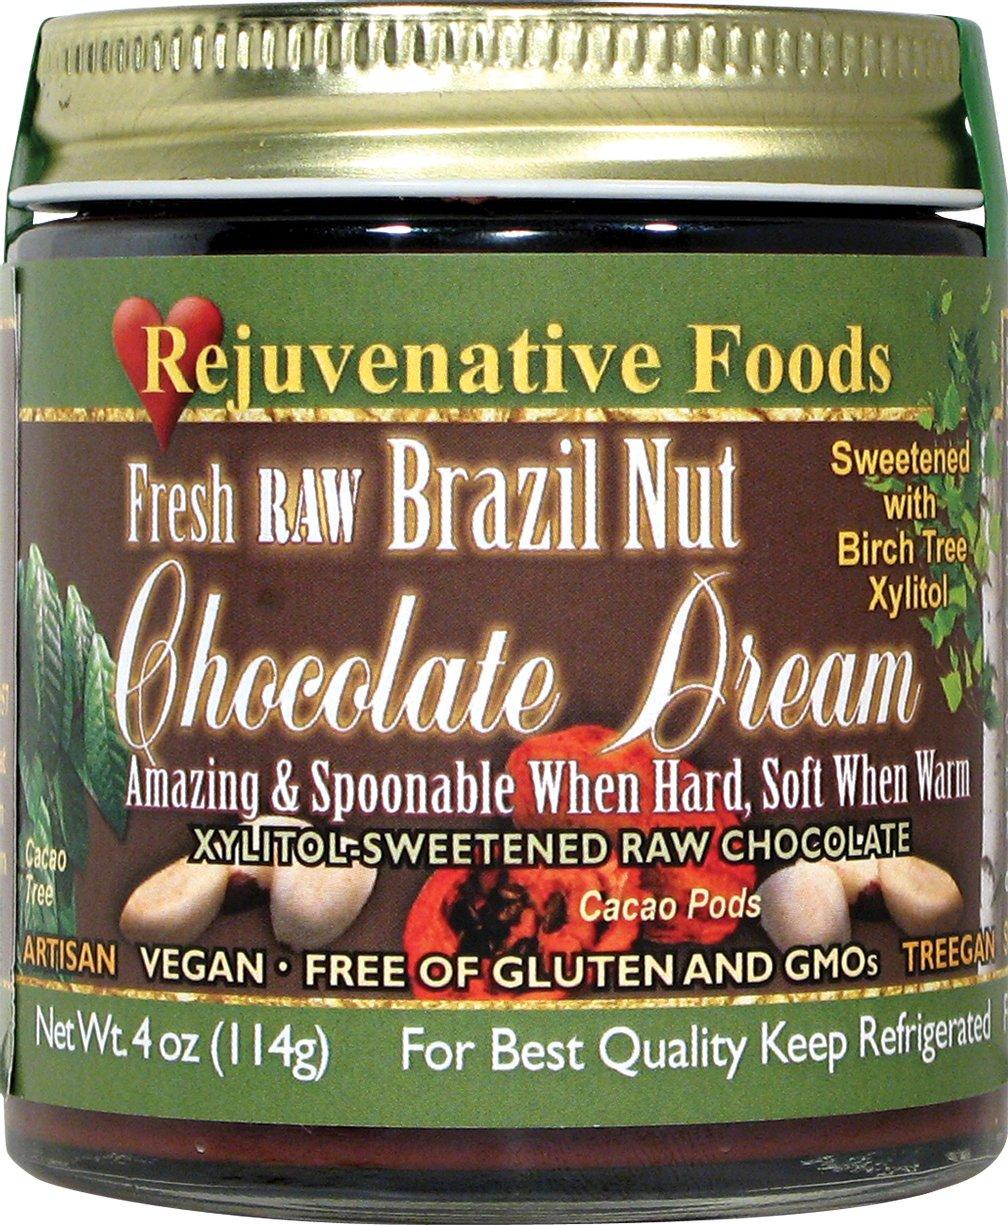 Xylitol-Sweet Organic Raw Chocolate Brazil-Nut Dream Pure Fresh Nutritional Dairy-Free Antioxidants StoneGround white-sugar-free fudge candy-in-glass-jar Minerals Rejuvenative Foods-18 oz by Rejuvenative Foods